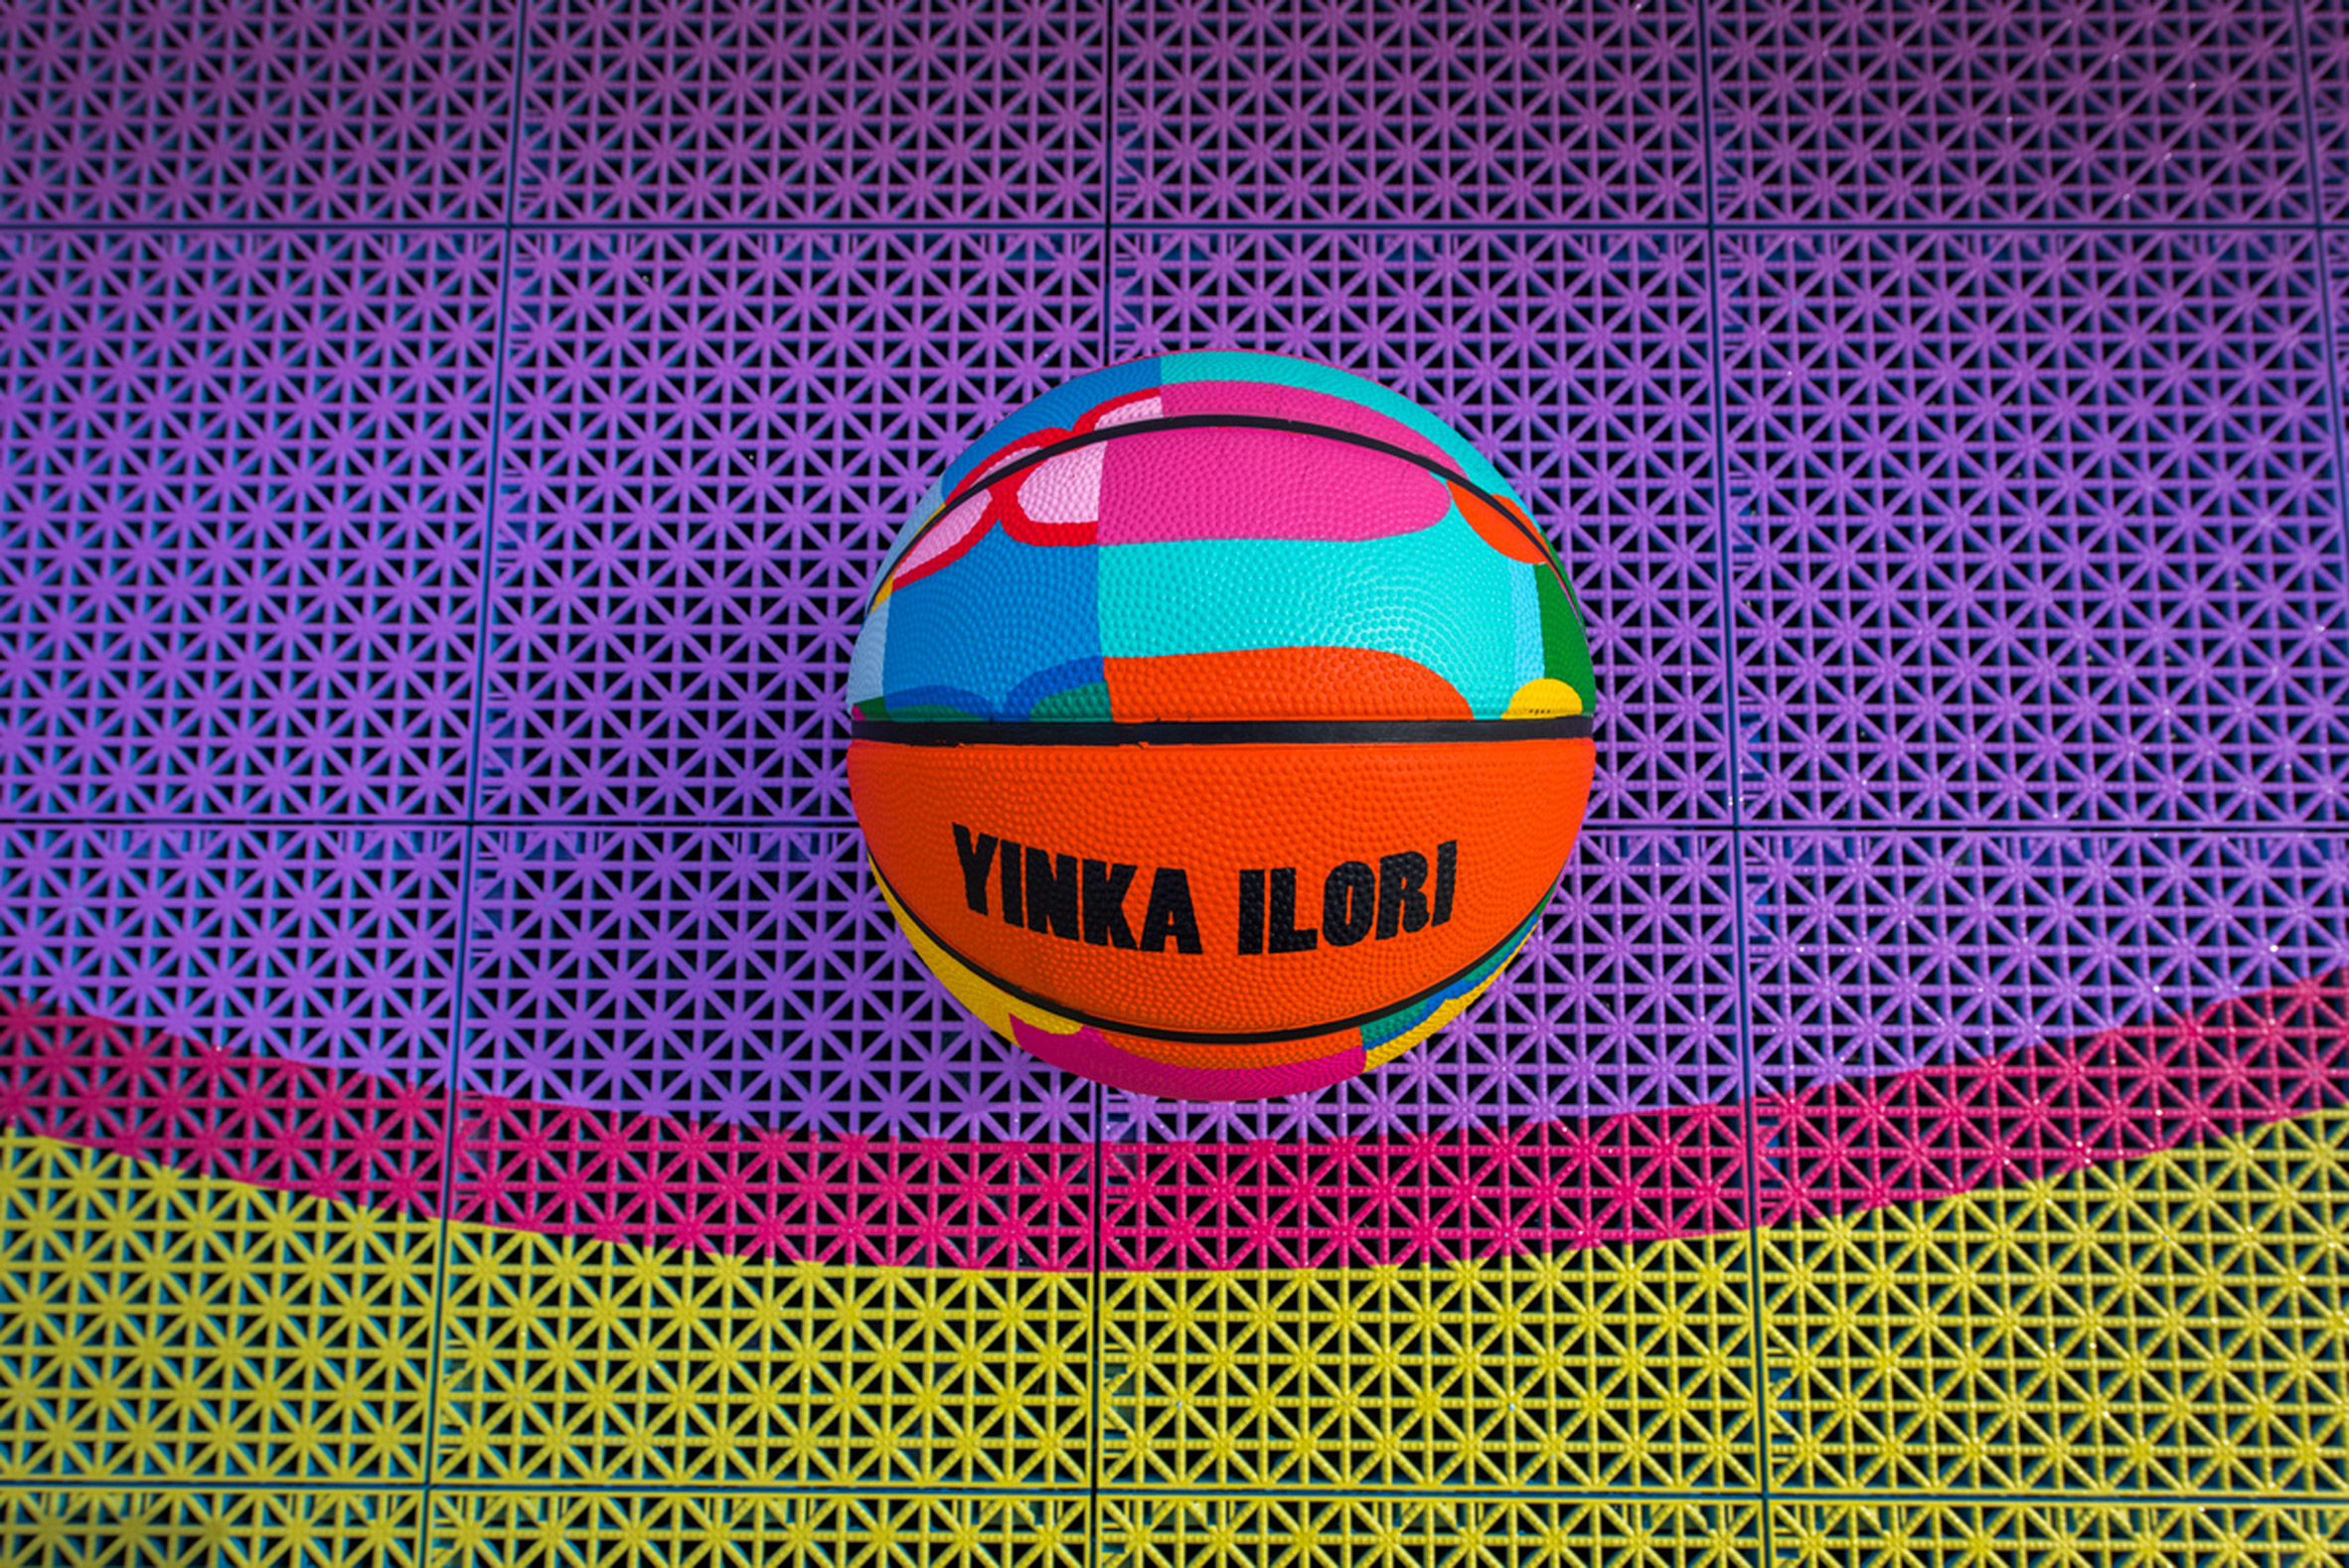 Close-up of Yinka Ilori basketball on 3D printed sports tiles